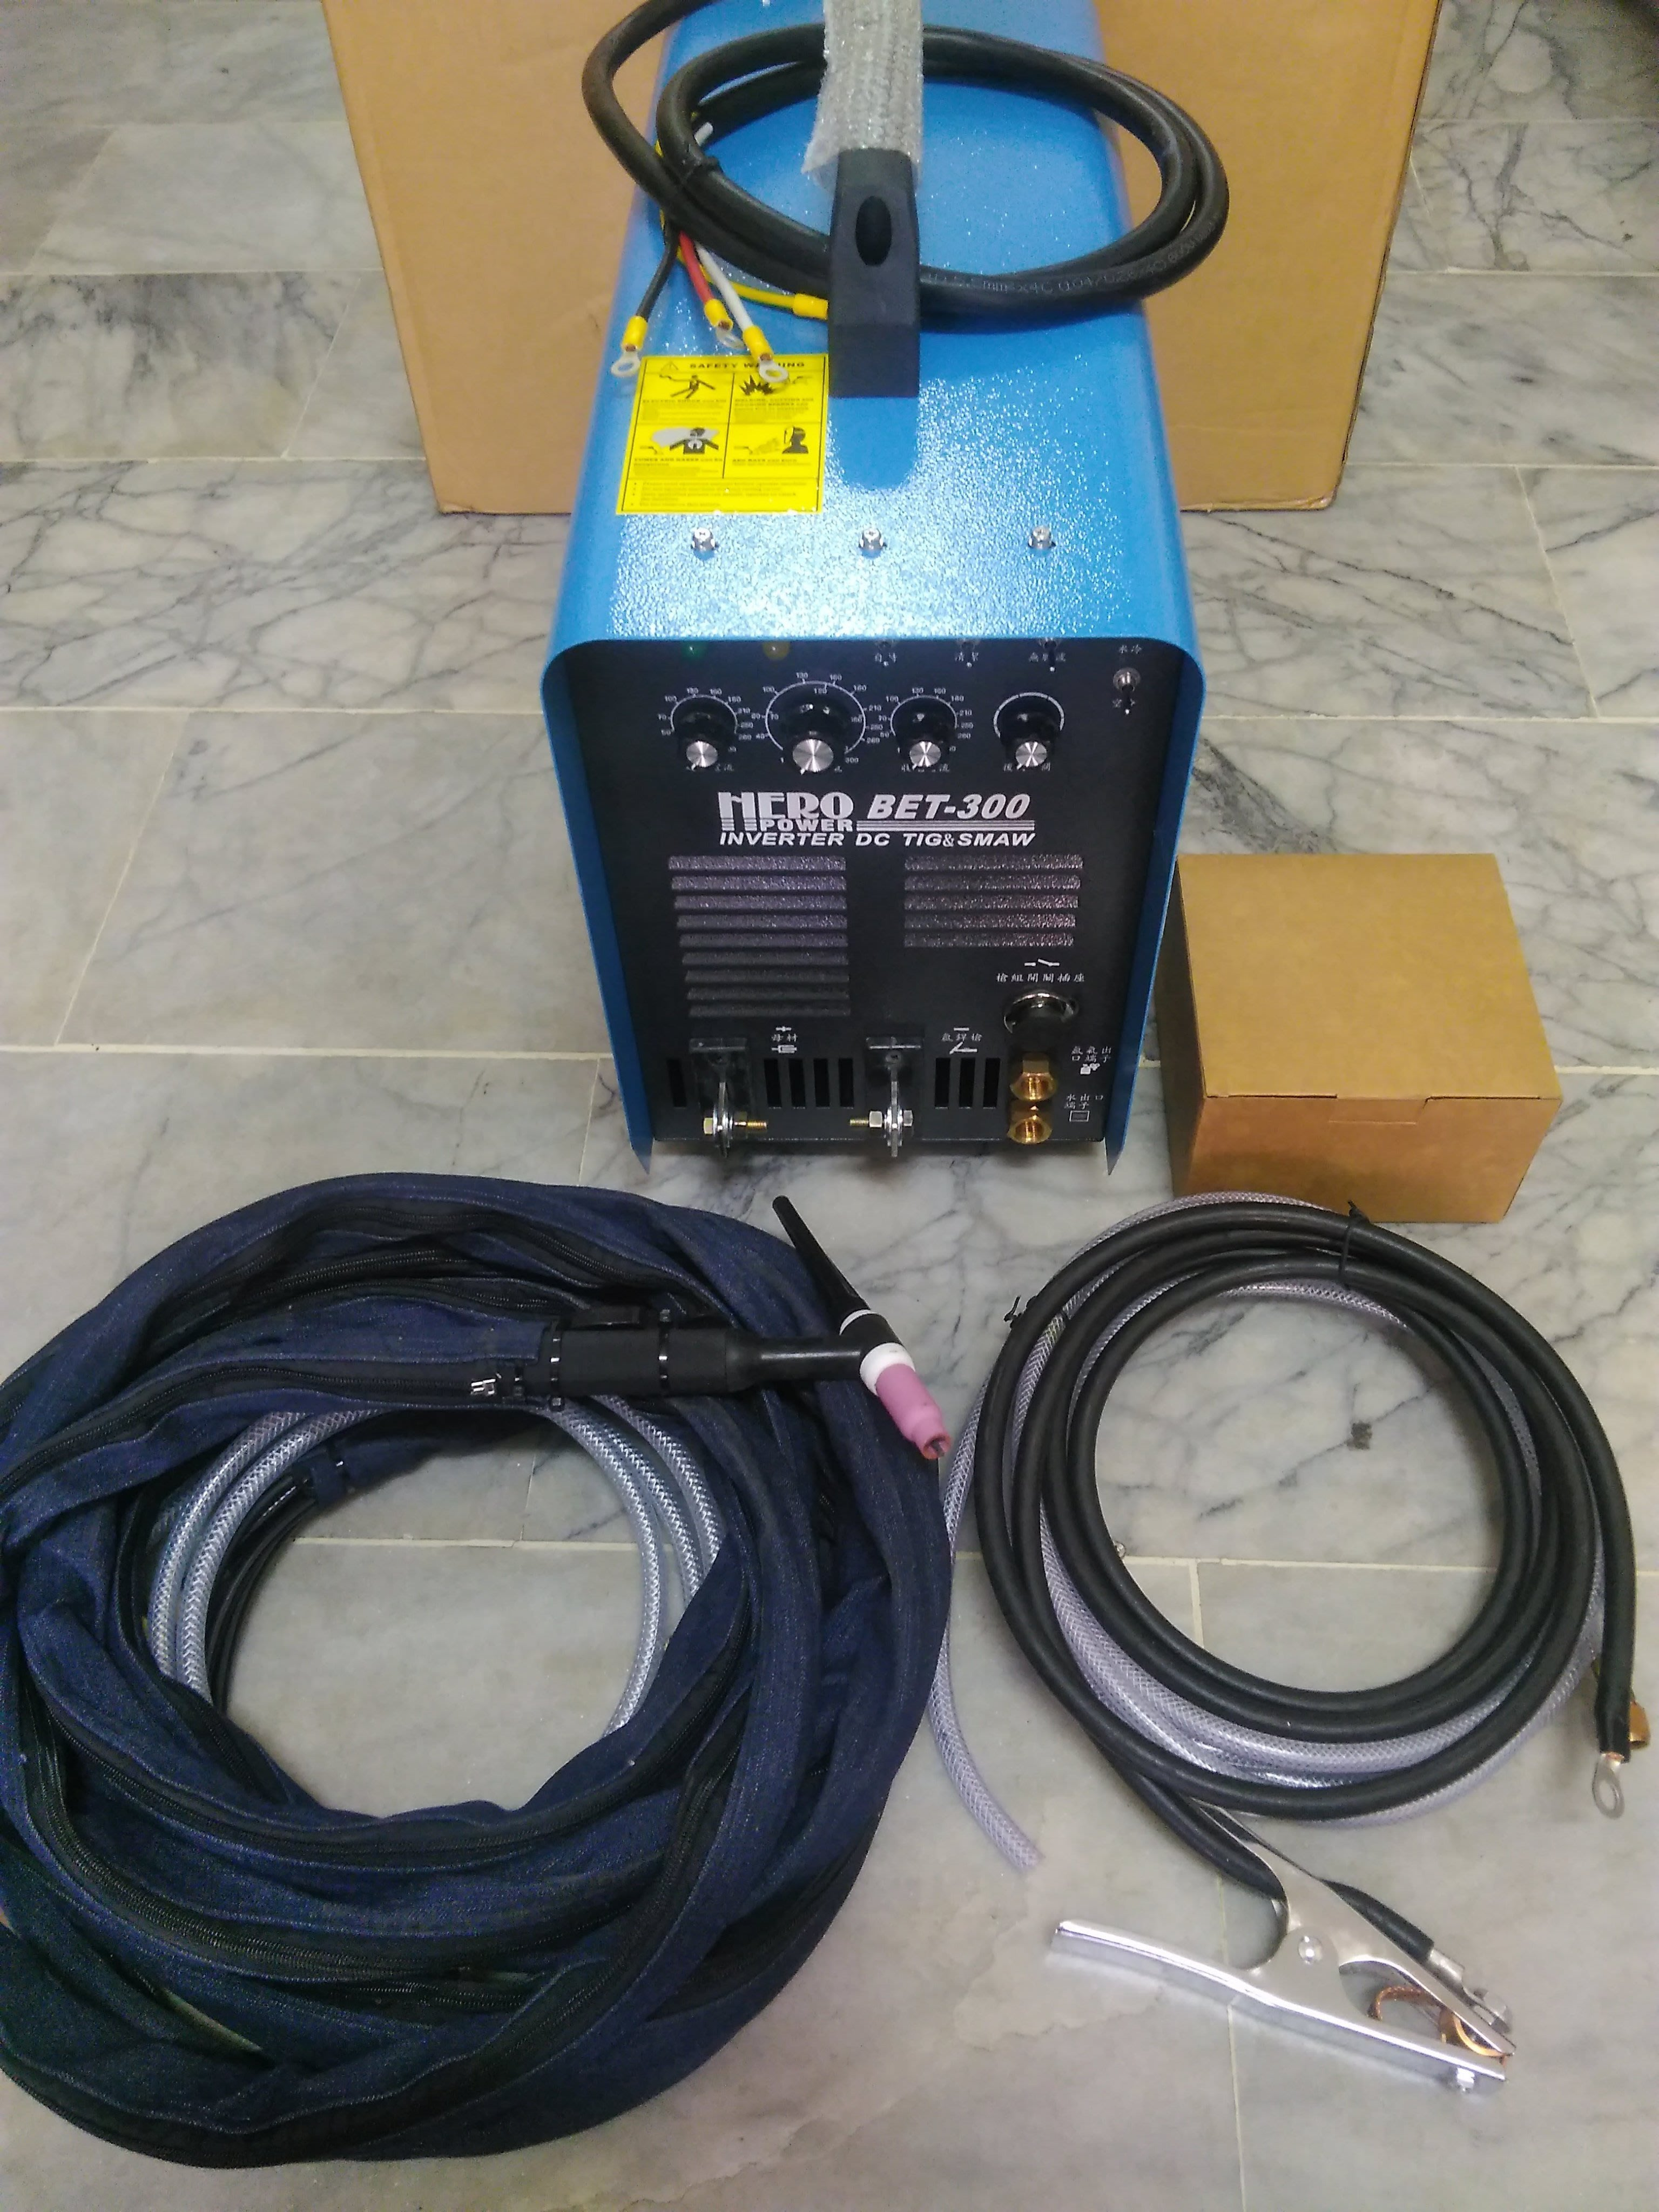 TIG氬焊機、HERO好牽手BET300氬焊機、業界品質最穩定機型(台灣製造220V單相、三相電壓適用)(含10L水箱)